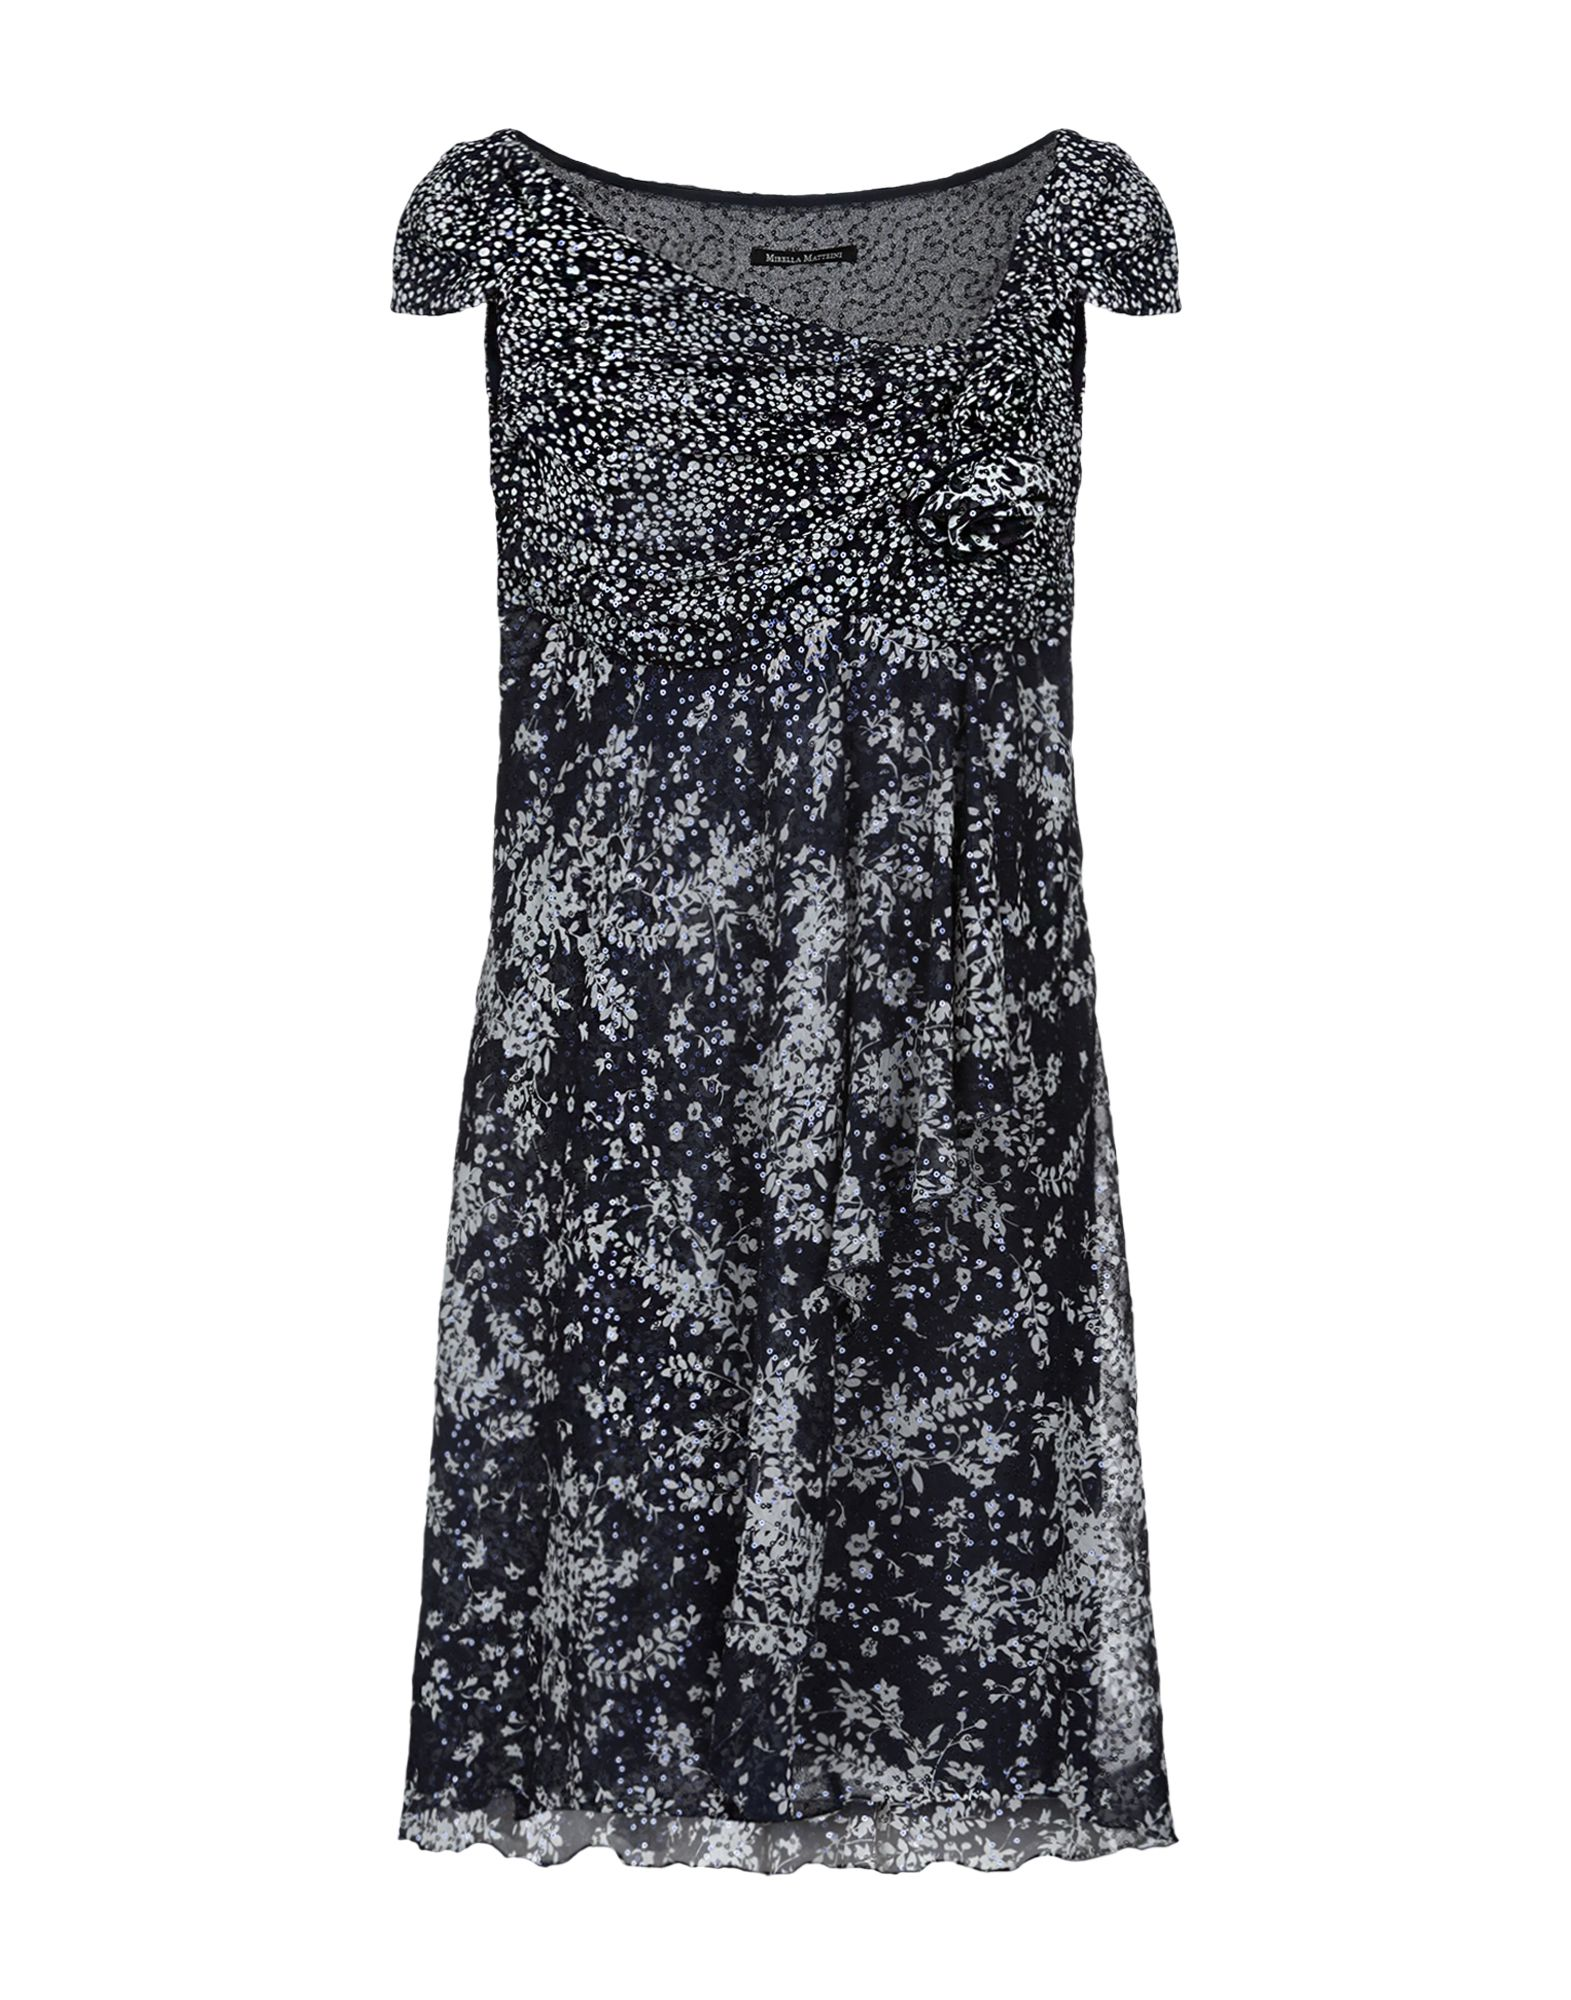 MIRELLA MATTEINI Короткое платье mirella matteini повседневные брюки